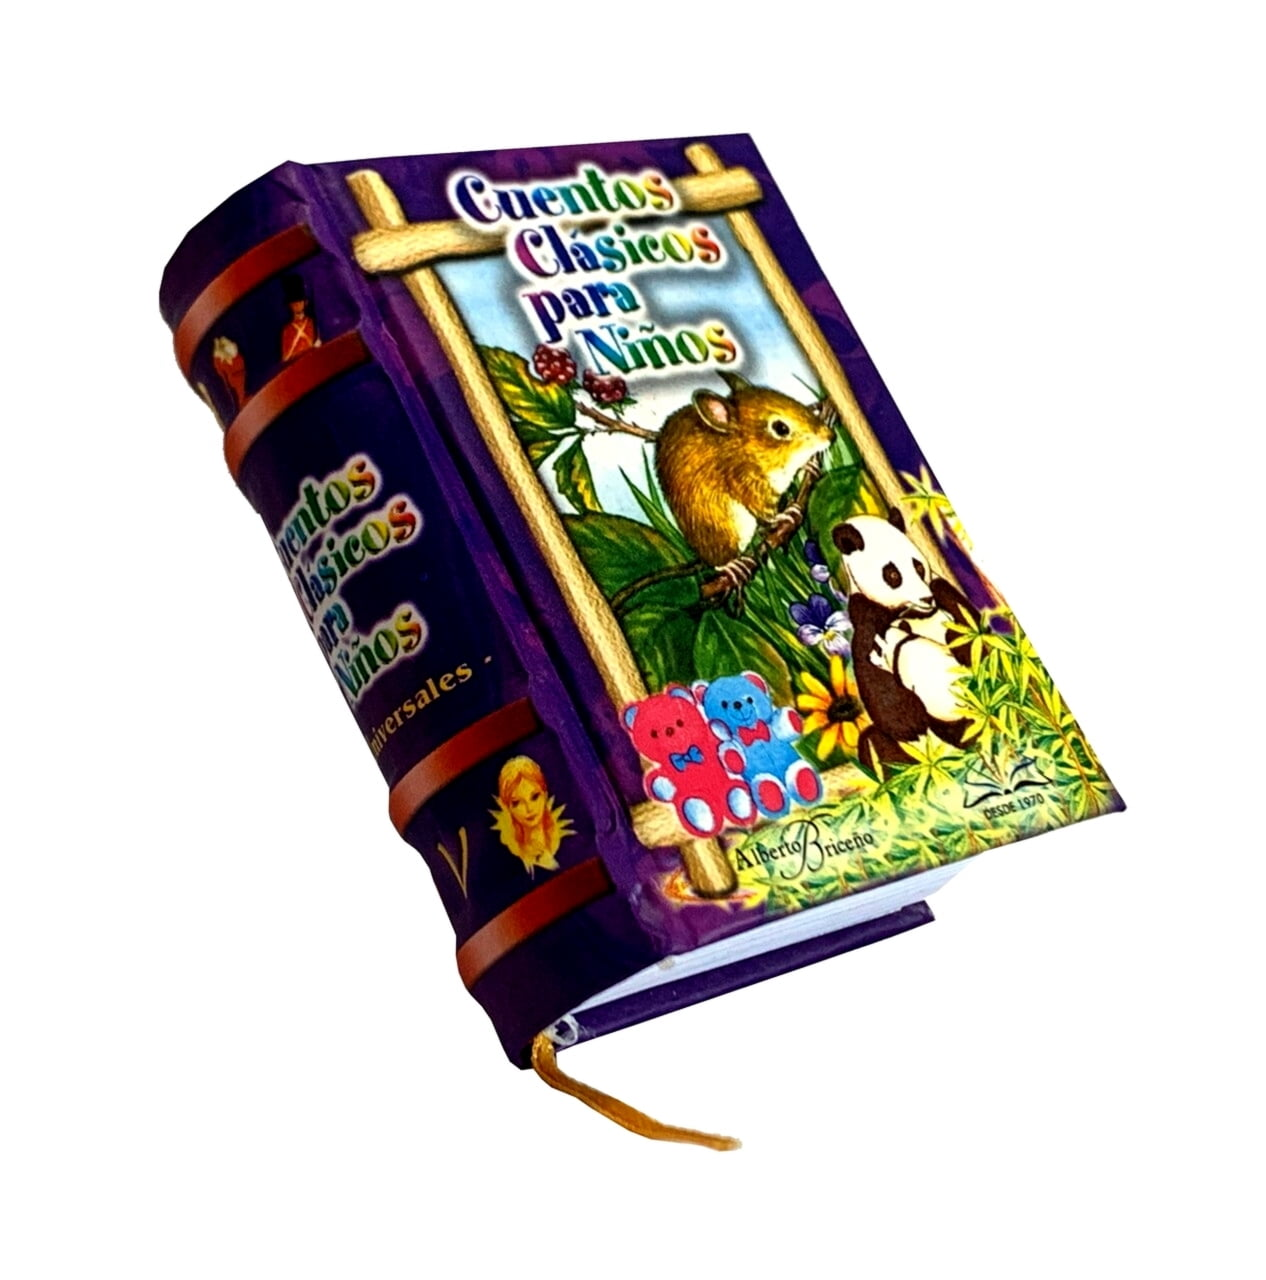 cuentos-clasicos-V-miniature-book-libro